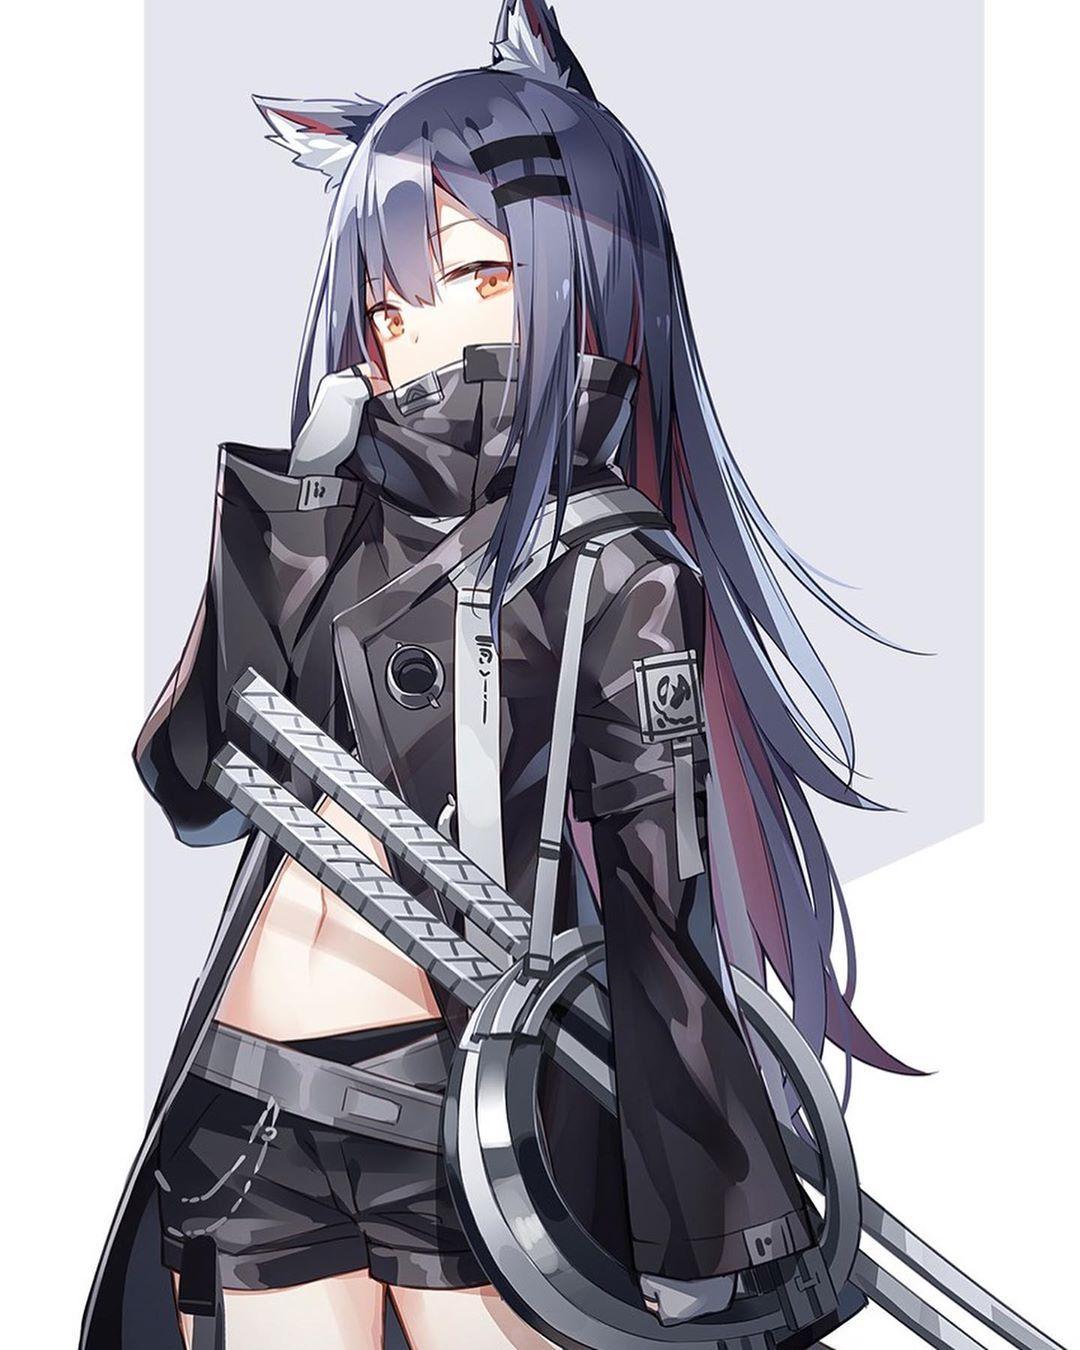 Nothing To Say Manga Girl Anime Wolf Girl Anime Warrior